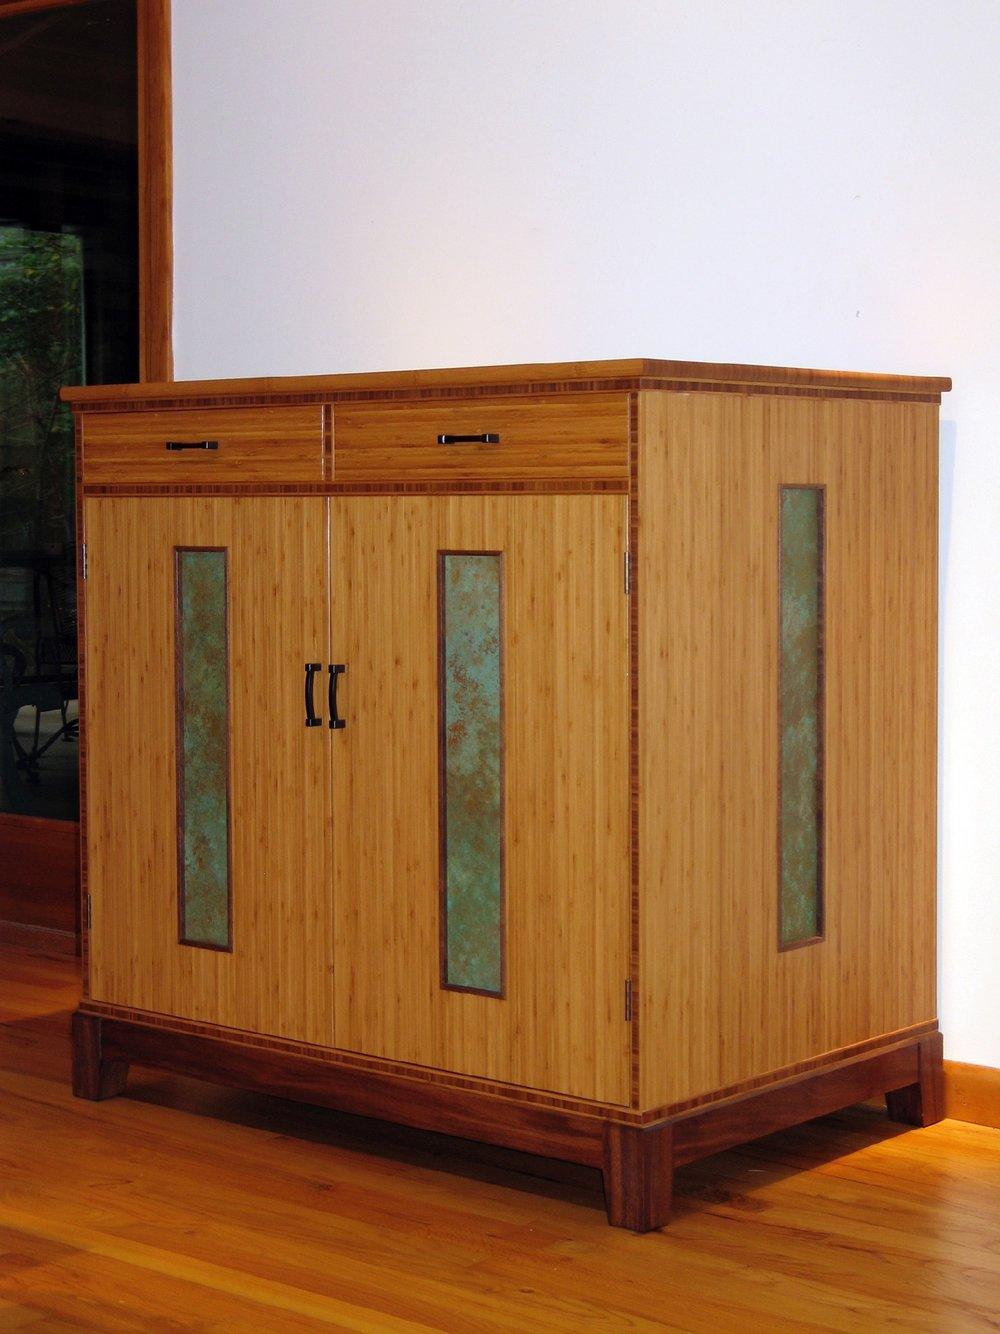 Kremer - bamboo, walnut, wenge, patinated copper panels